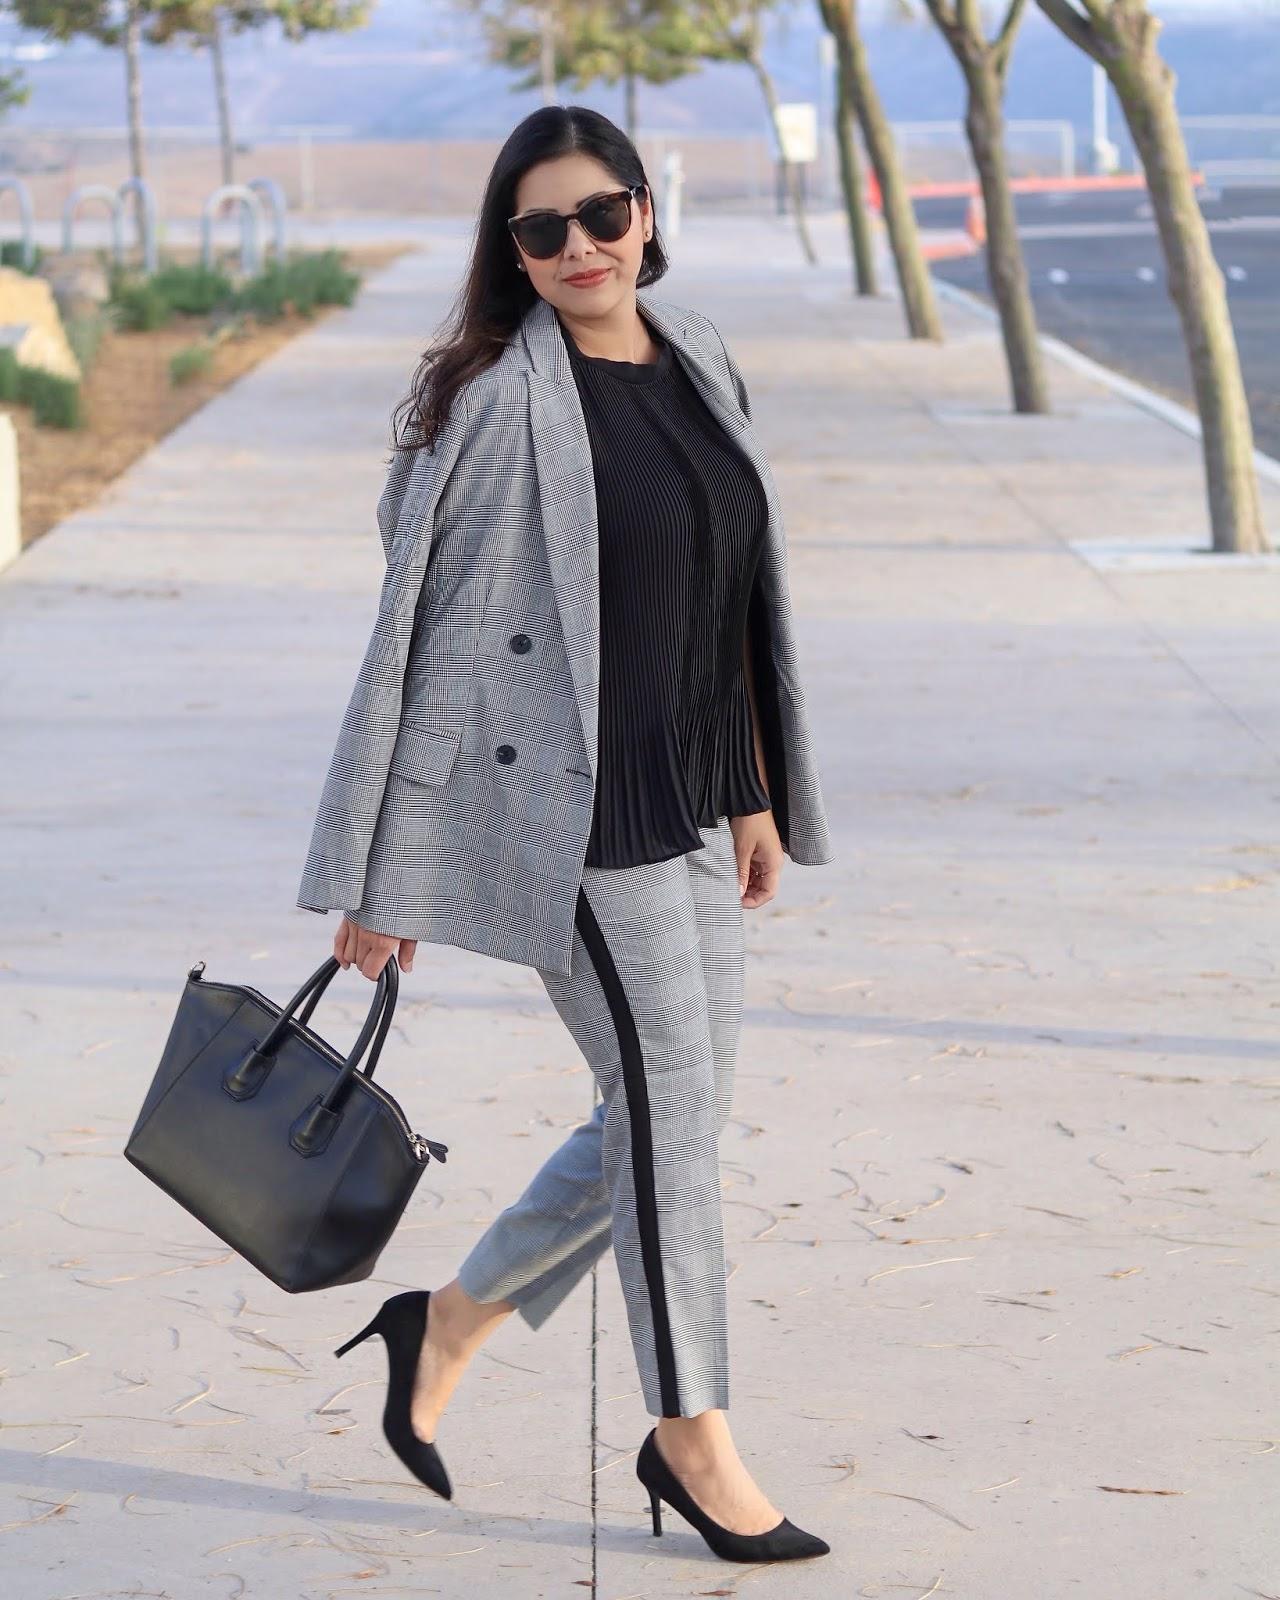 San Diego Fashion Blogger, Latina blogger in San Diego, San Diego influencer